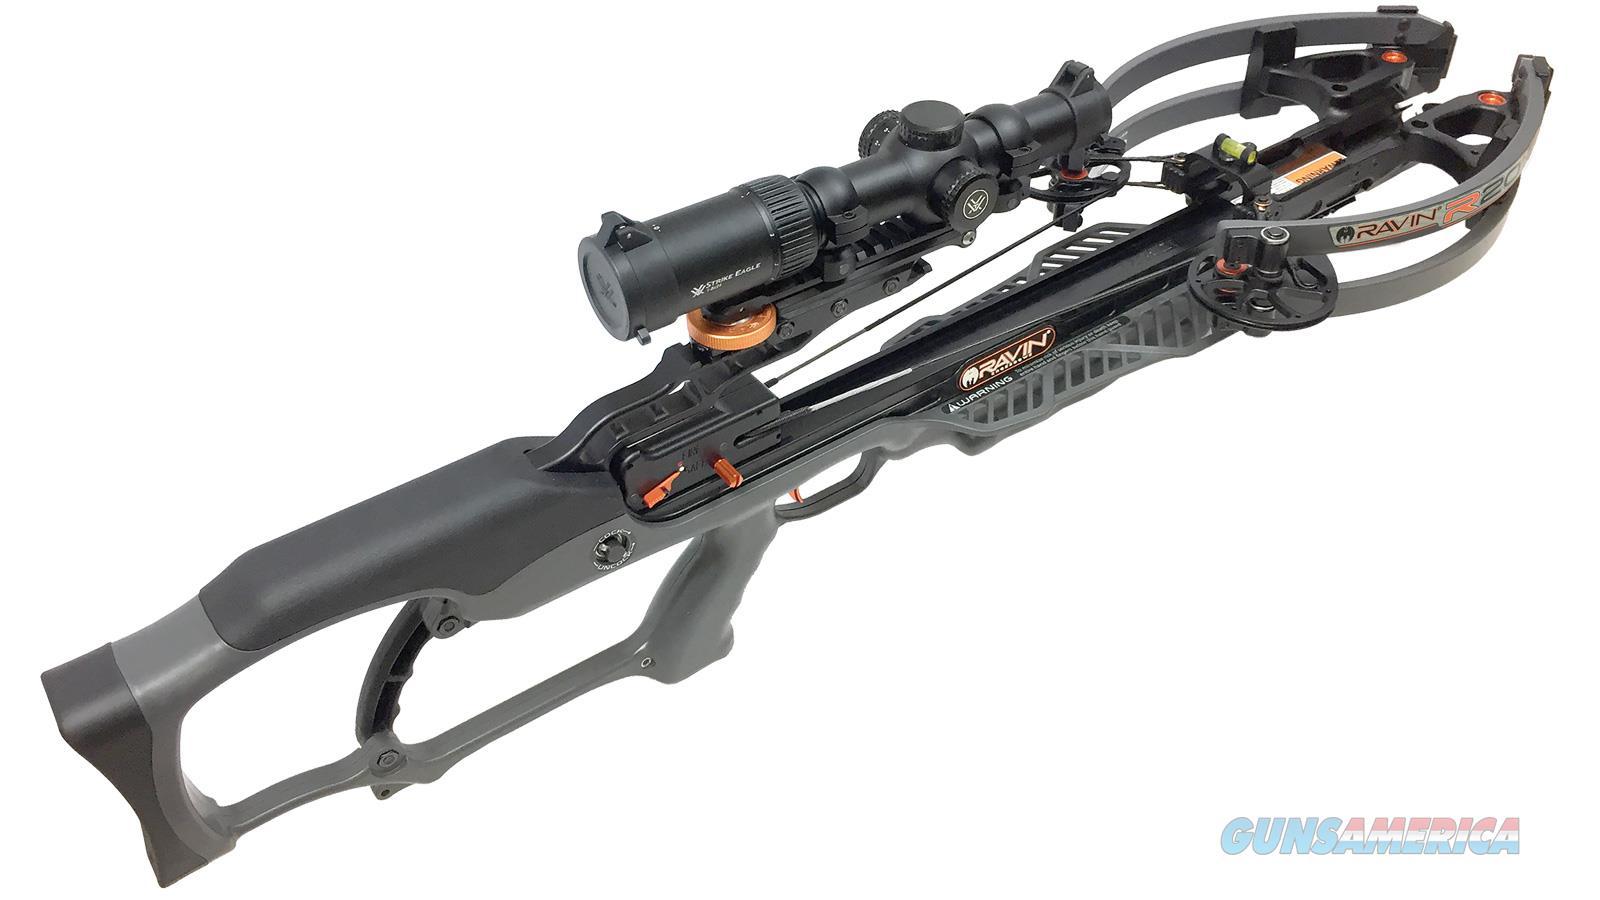 Ravin Crossbows Crossbow R20 Sniper Pkg Gunmetal Grey R023  Non-Guns > Archery > Bows > Crossbows